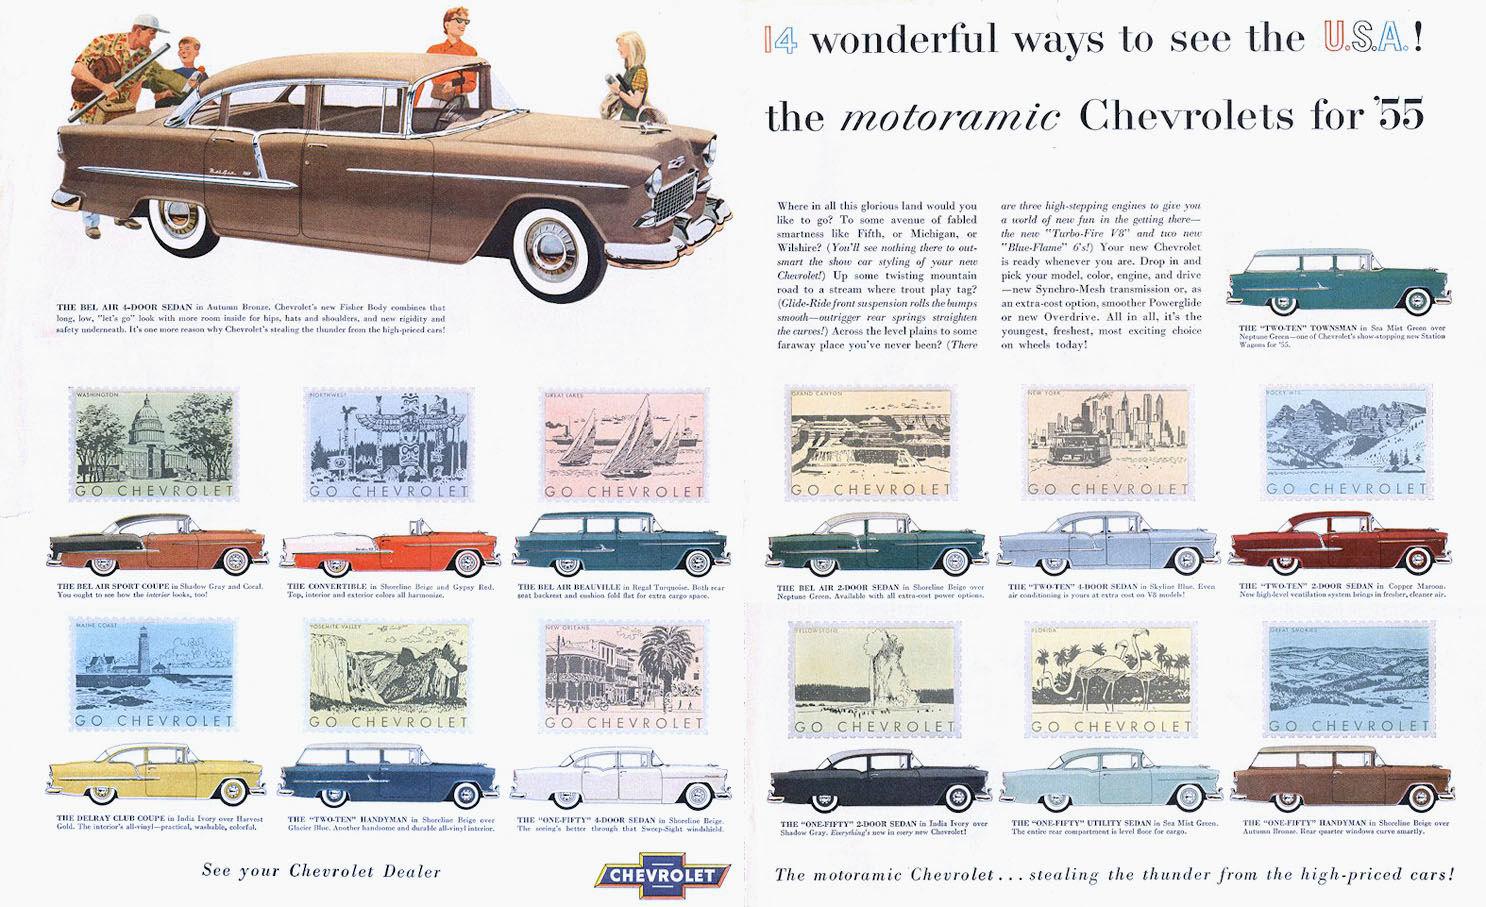 1955 Chevrolet Ad 01.